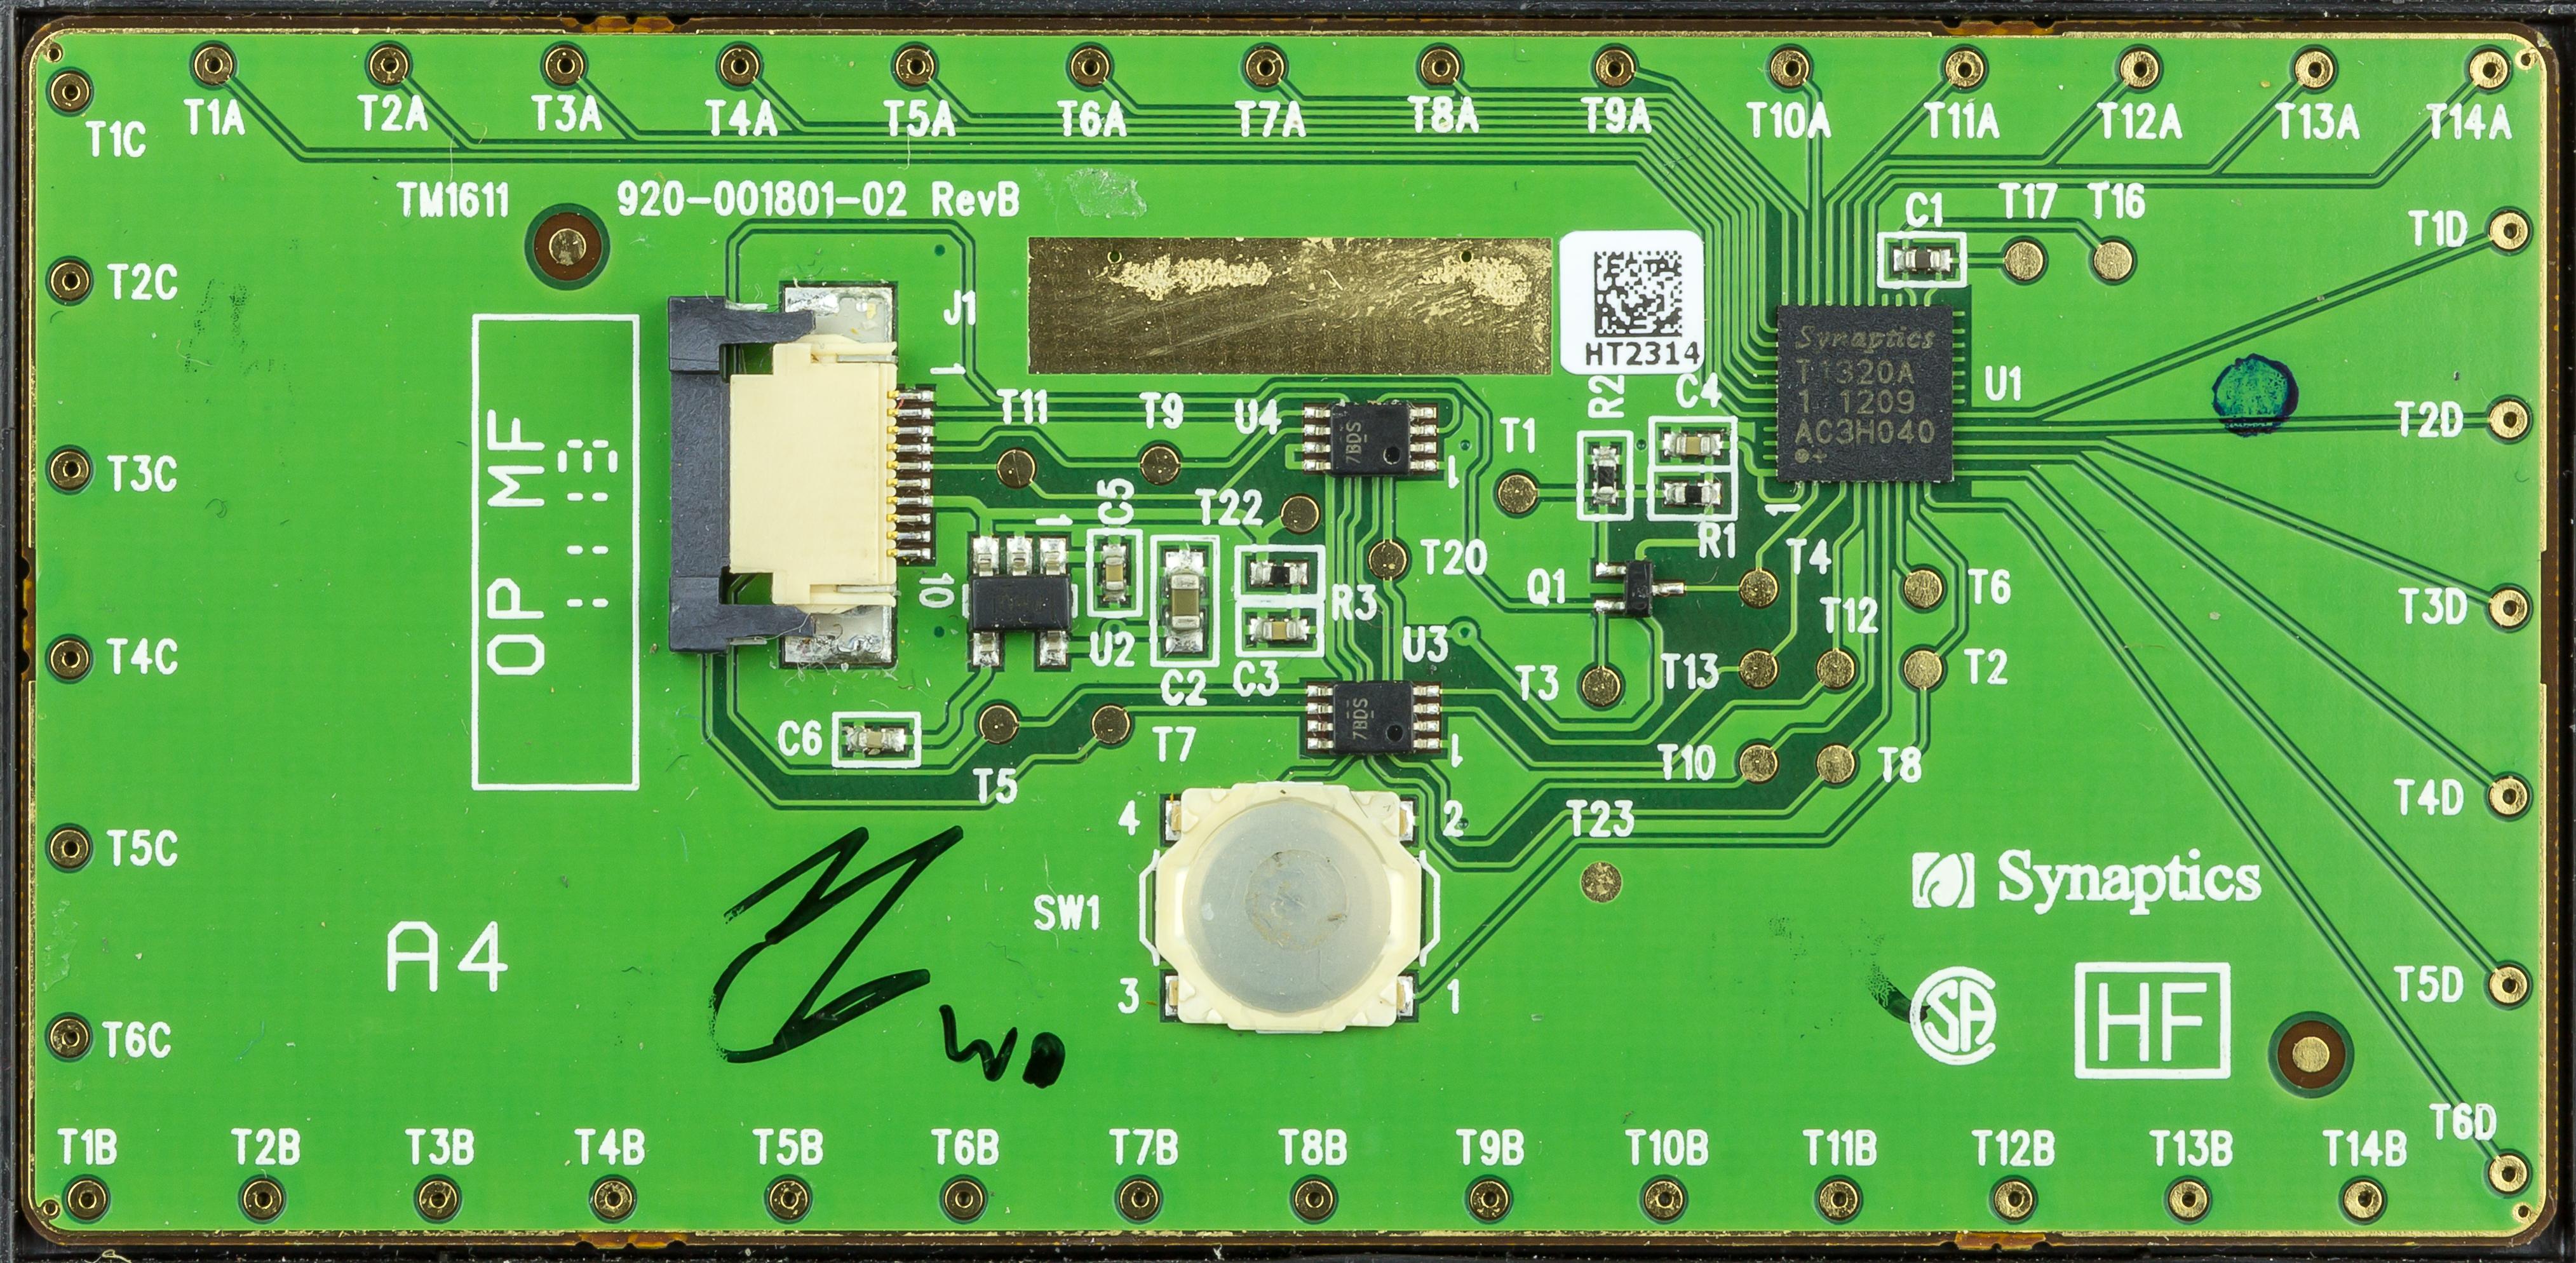 File:ThinkPad X230 - Synaptics touchpad 920-001801-02-0934 jpg